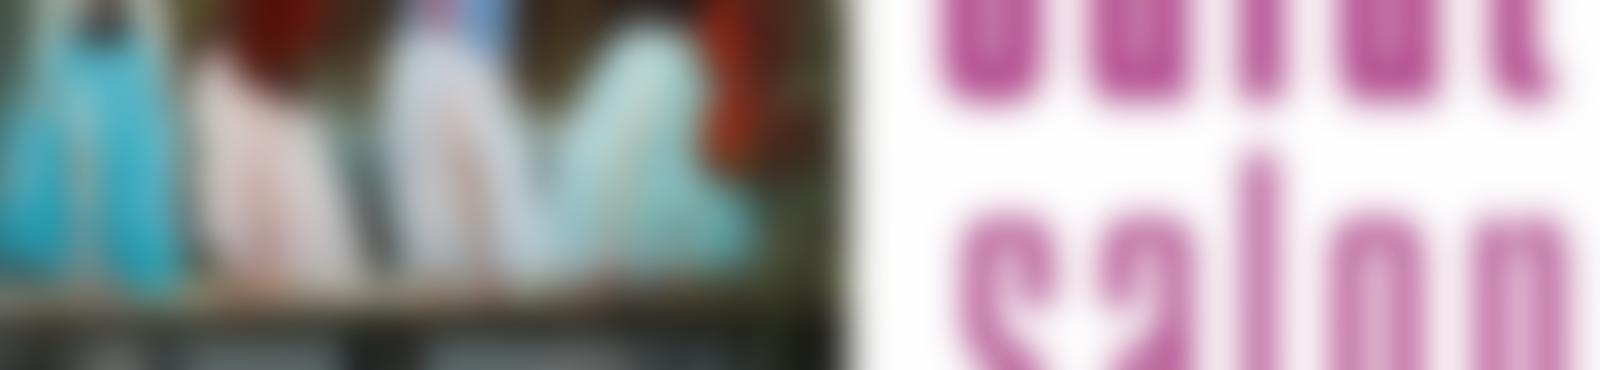 Blurred abb05947 09ad 44da b165 0d917ab3be1c